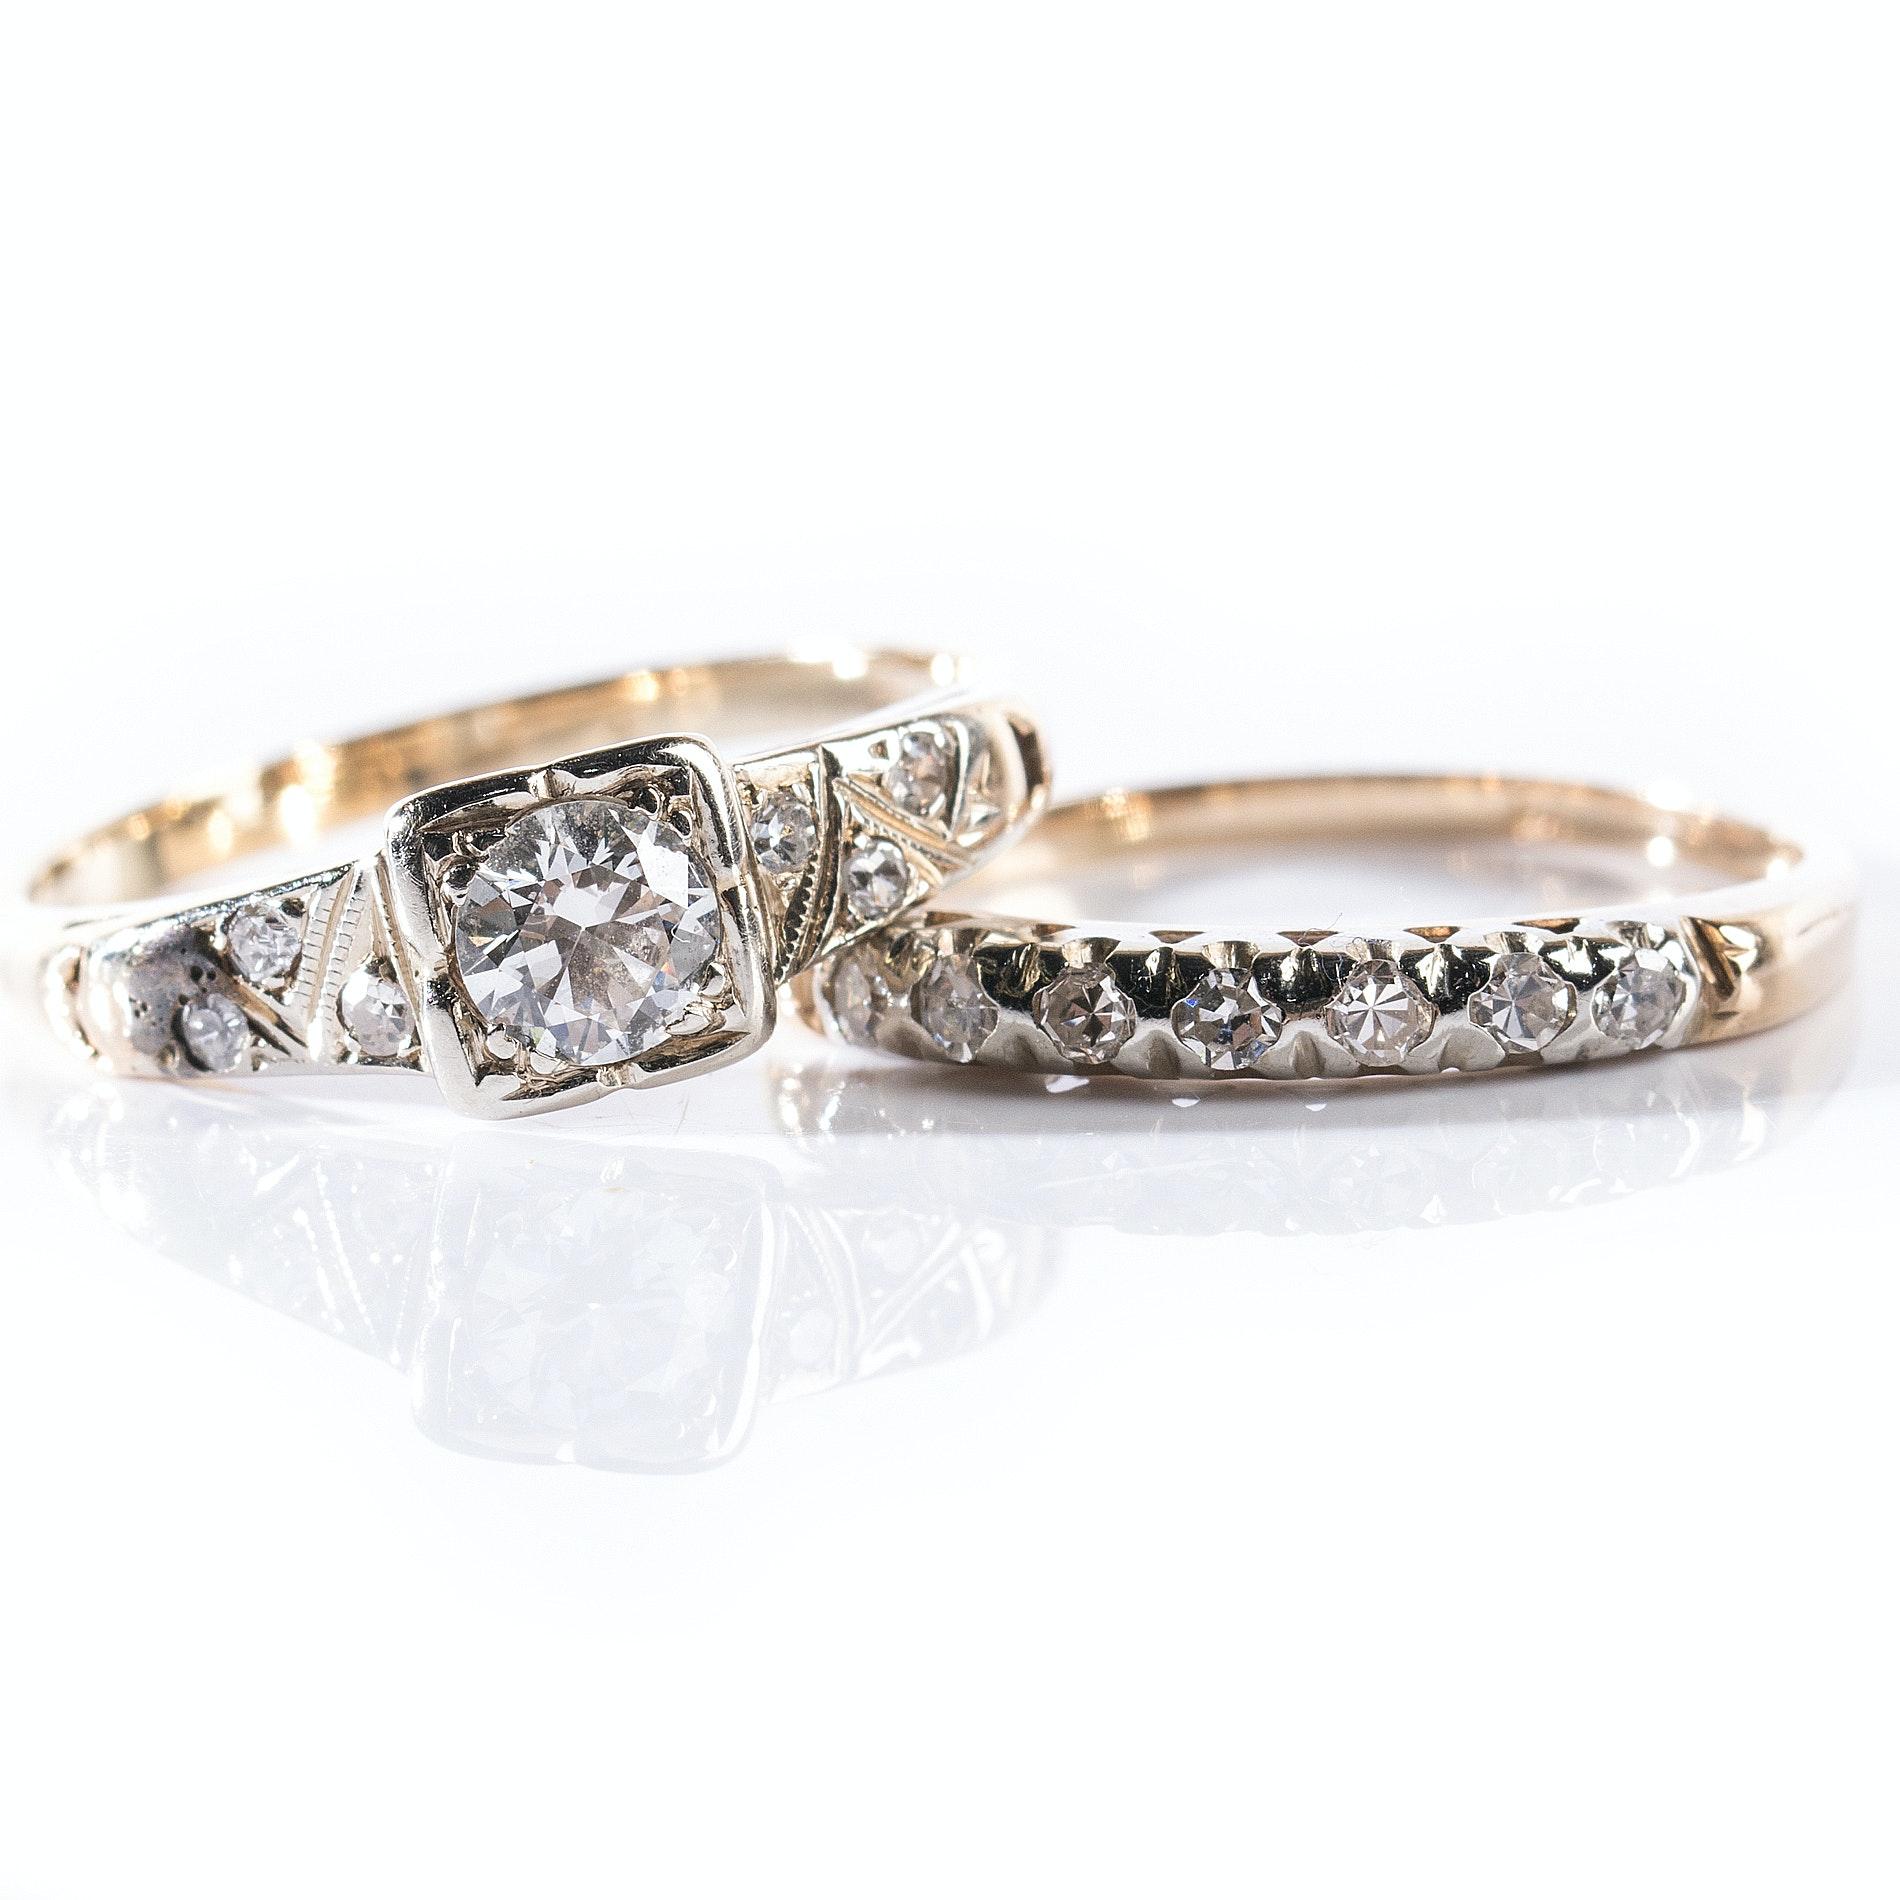 14K Yellow Gold Diamond Ring and Band